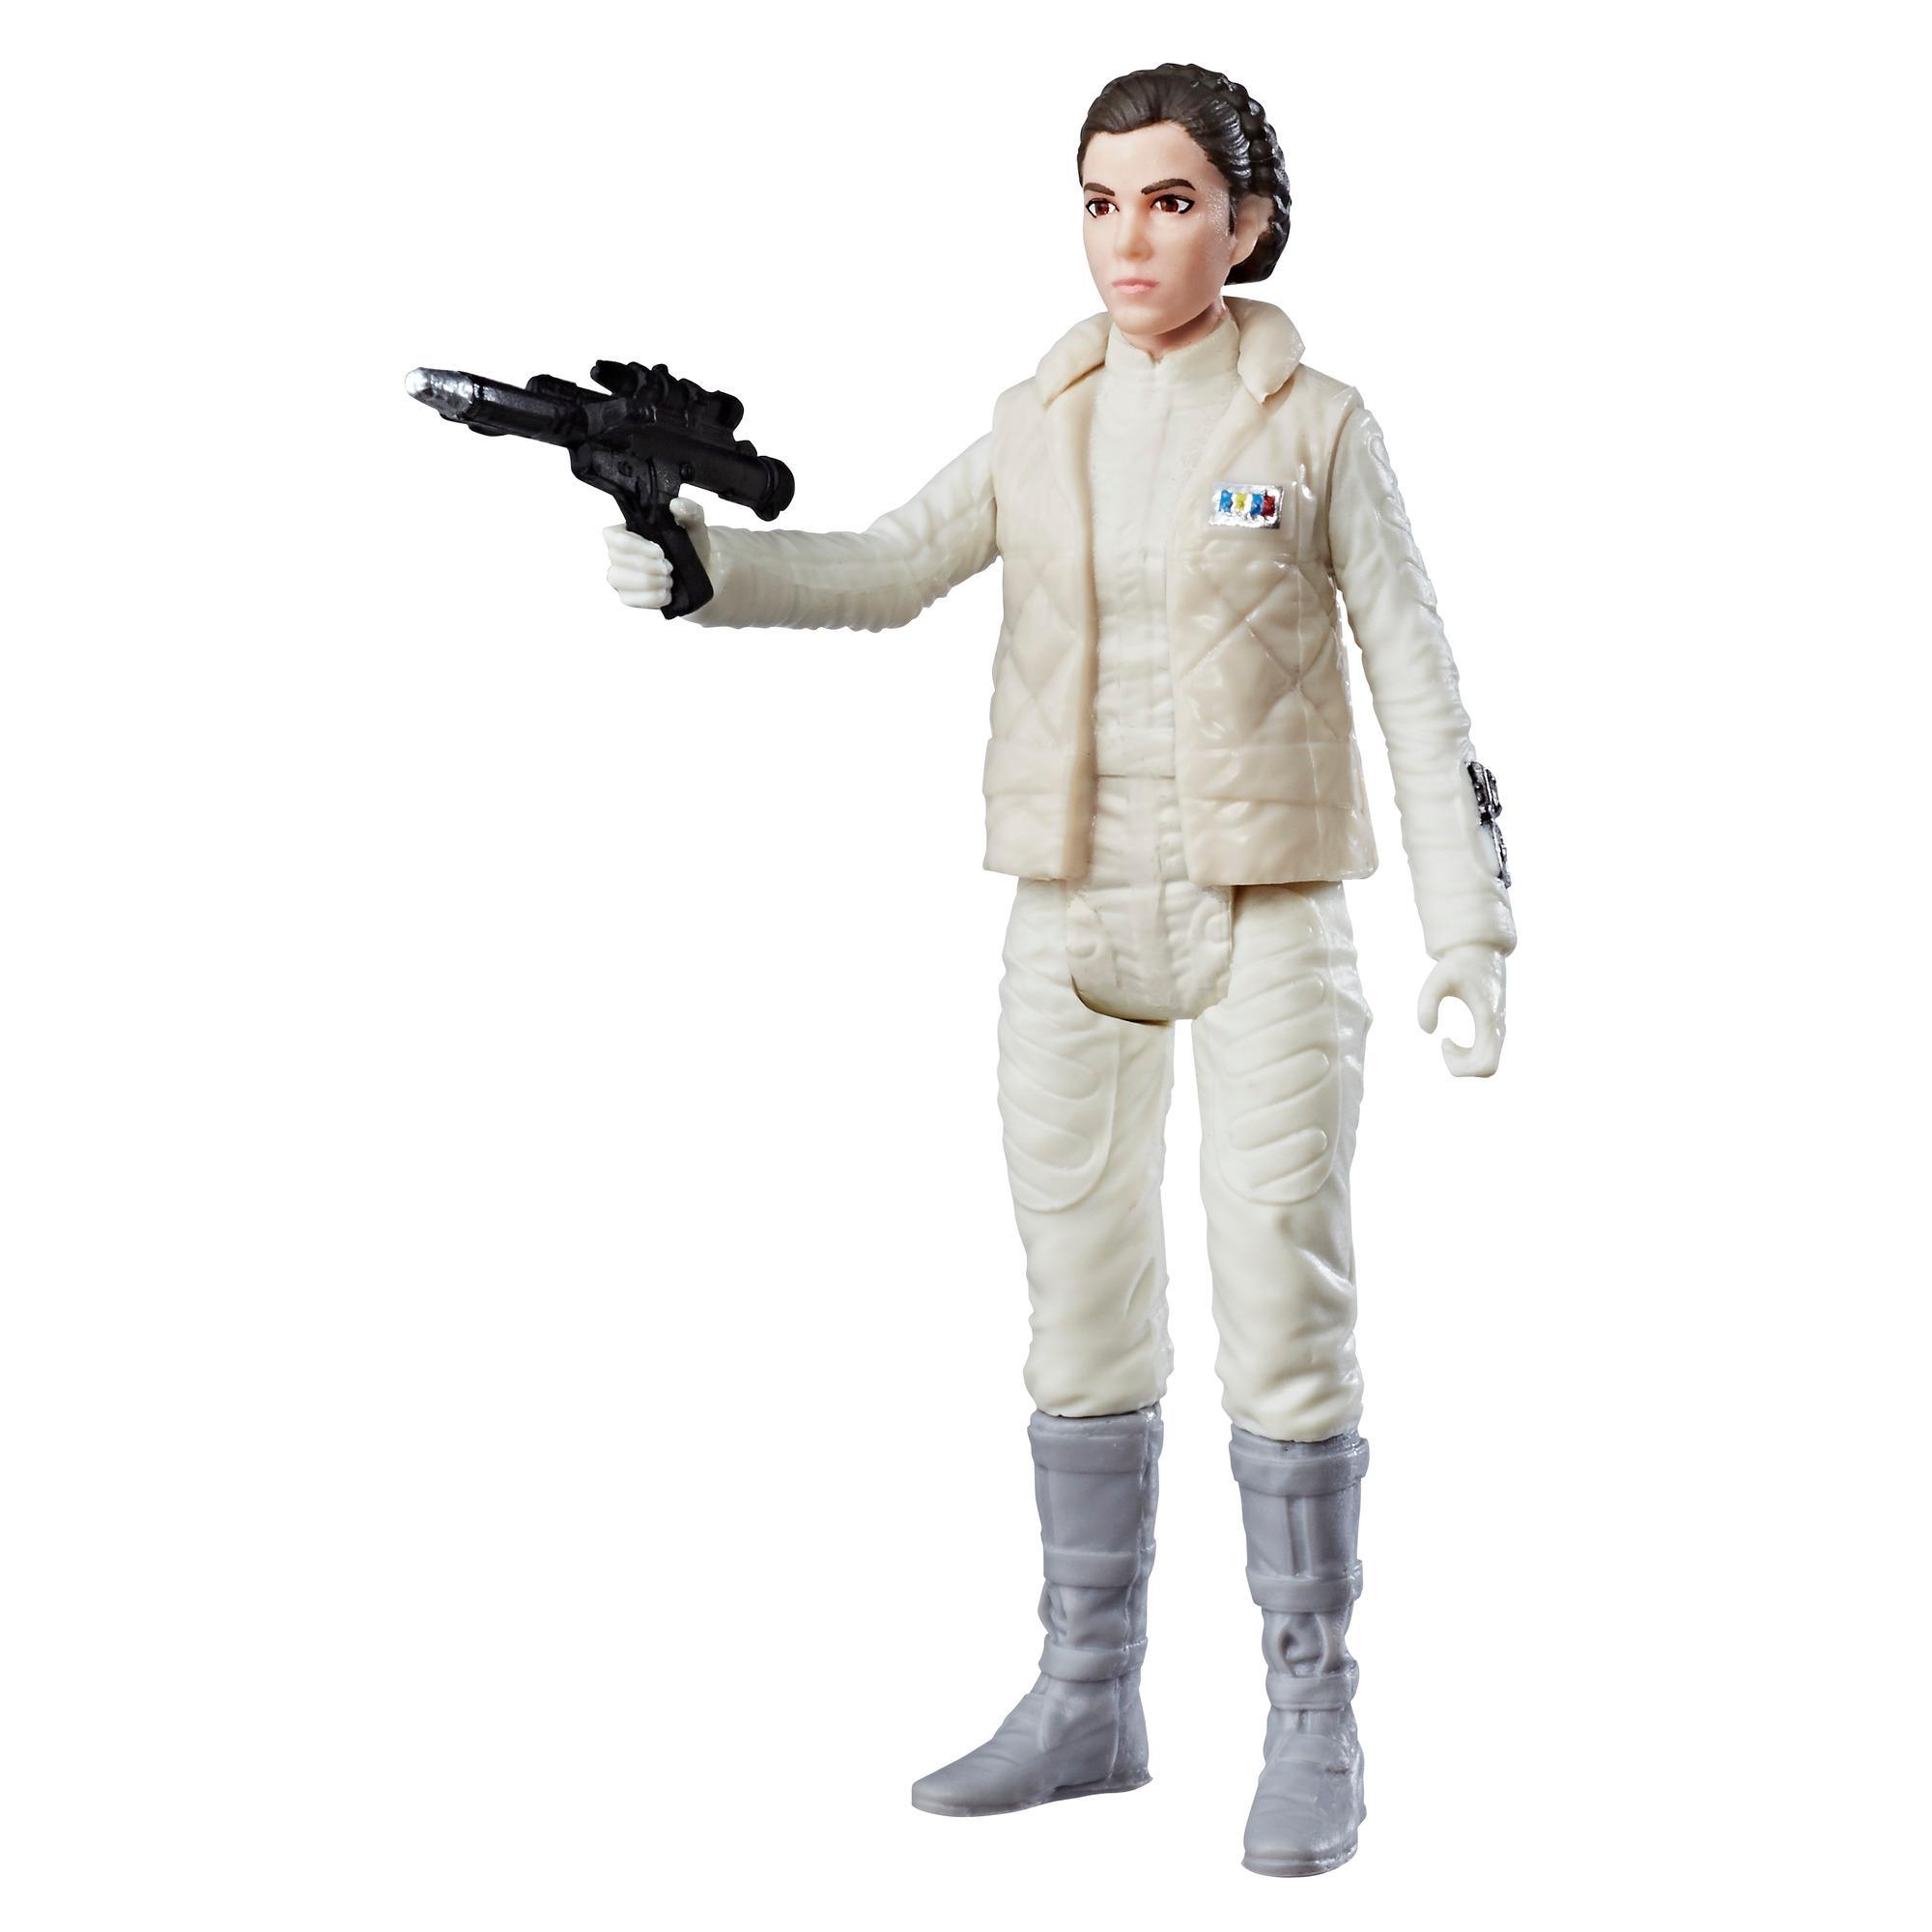 Star Wars Force Link 2.0 - Figura de la princesa Leia Organa